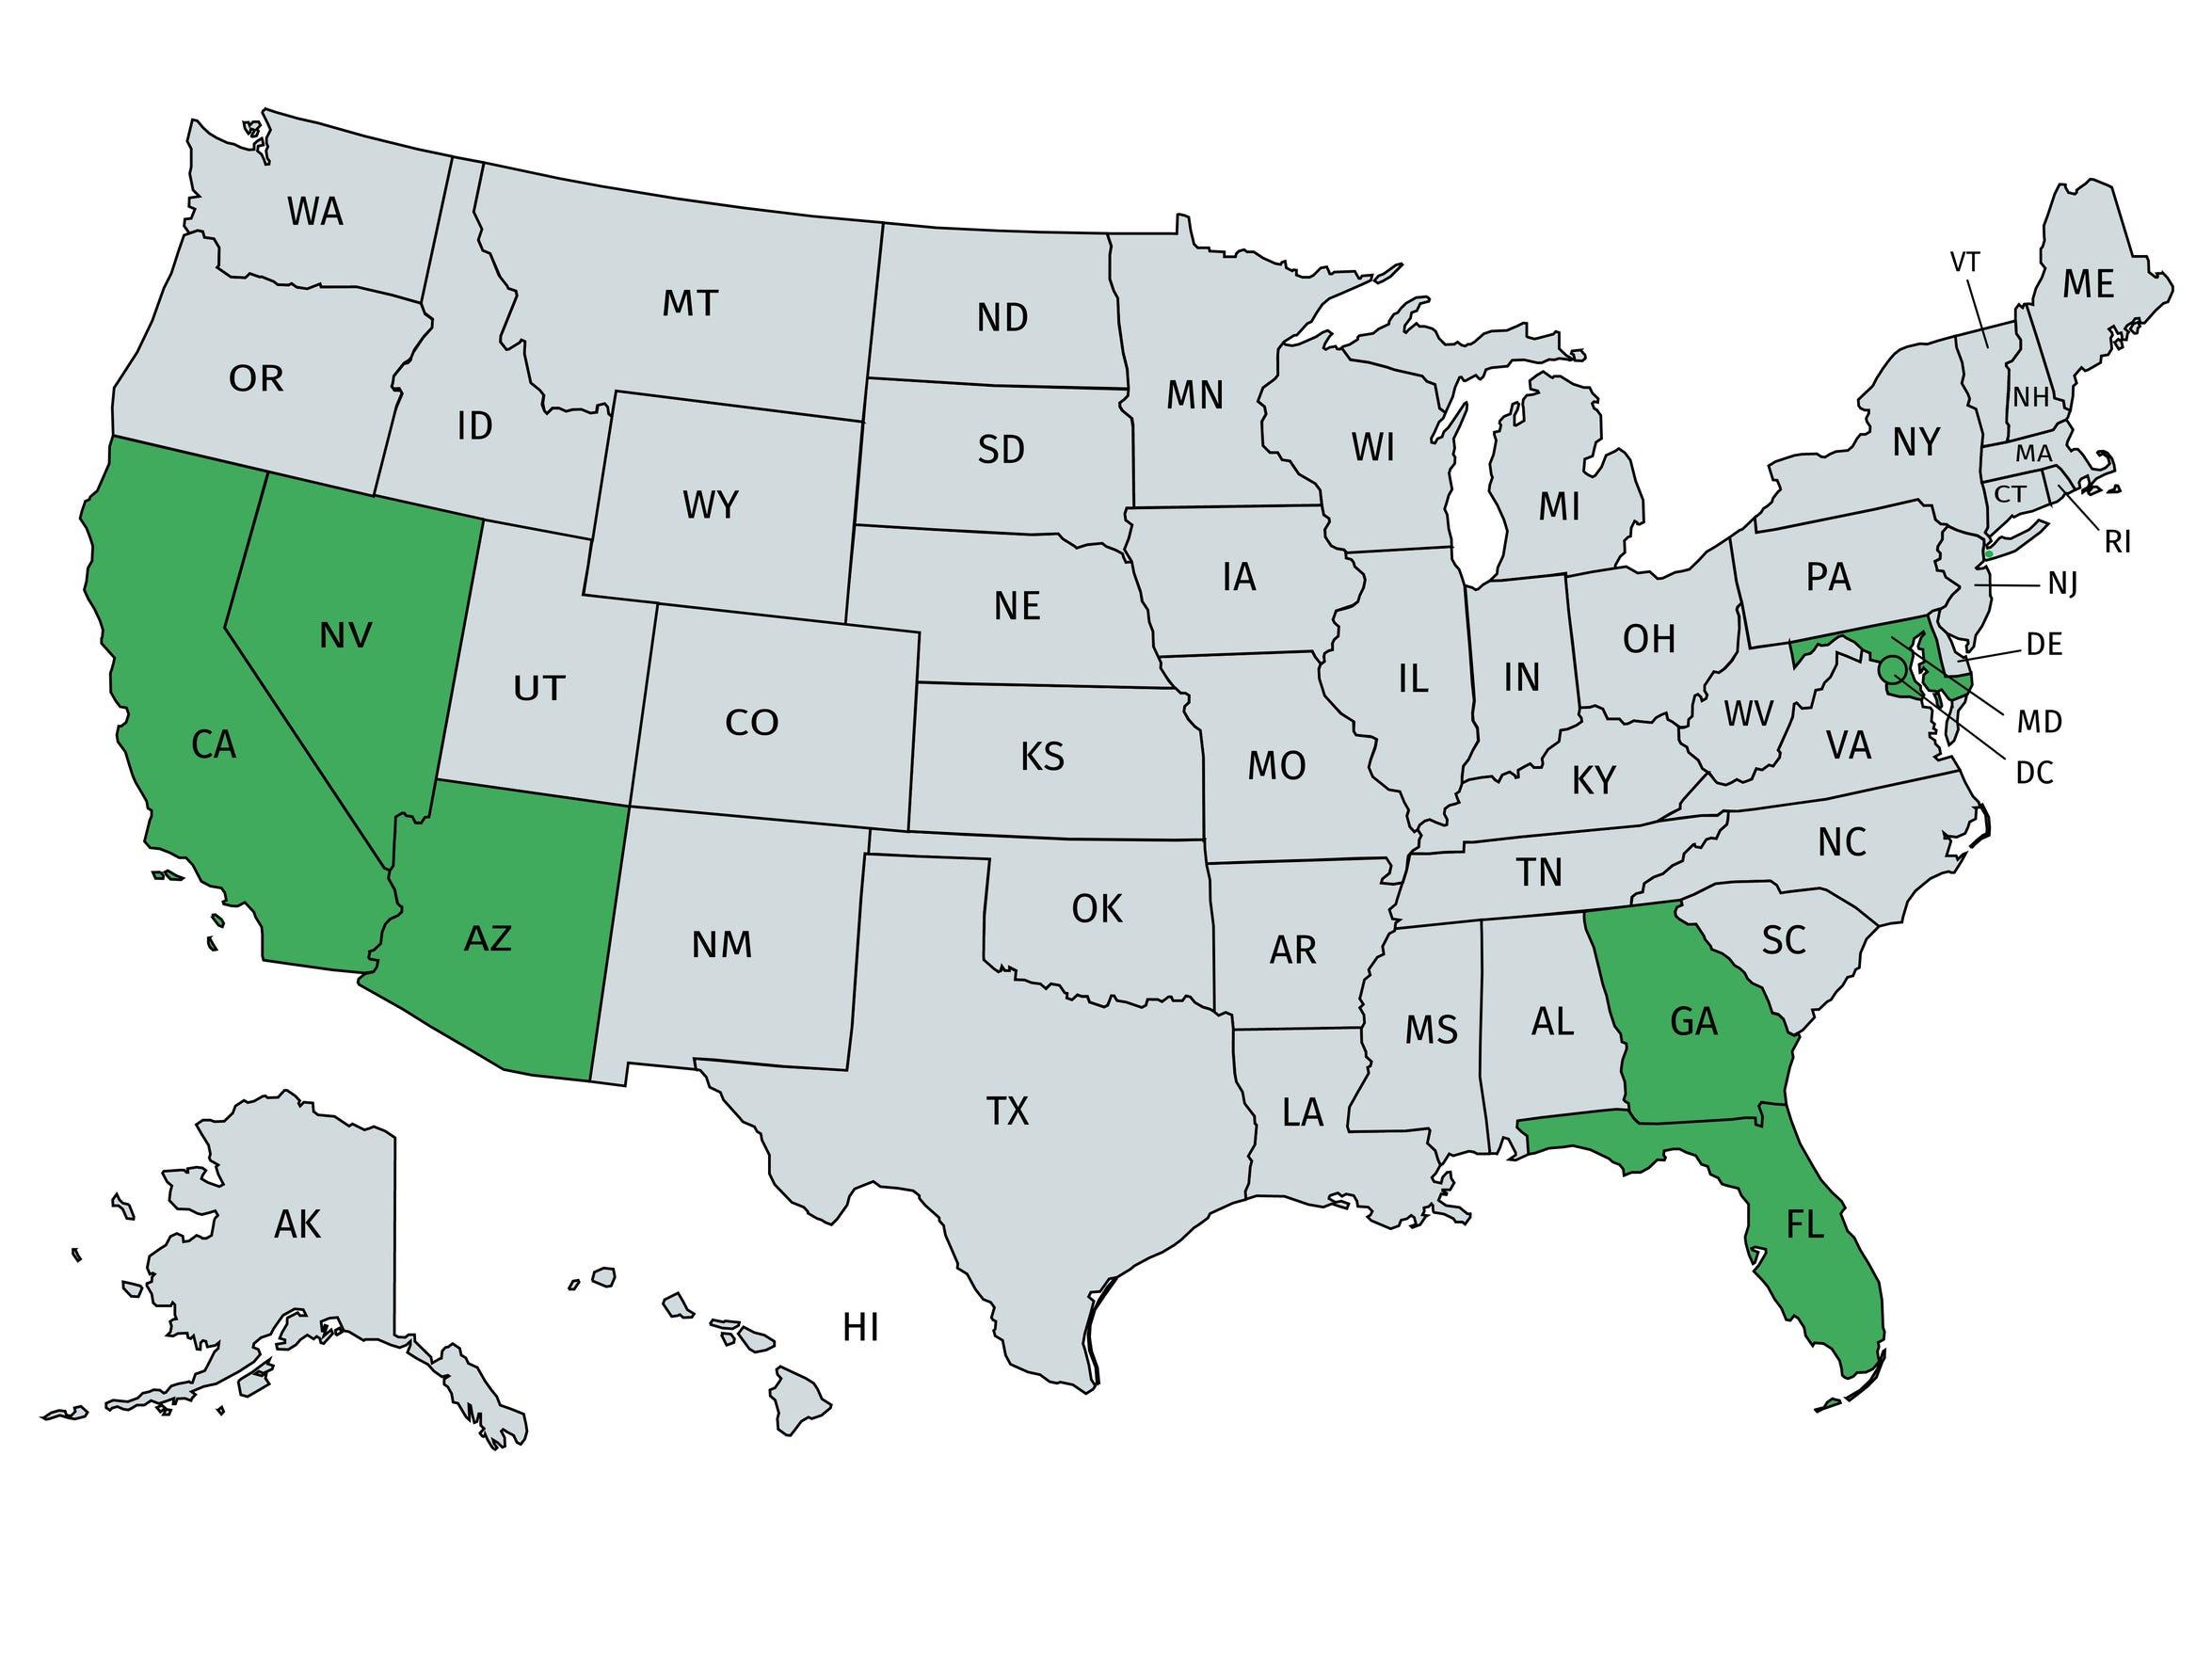 The states in green (California, Nevada, Arizona, Florida,